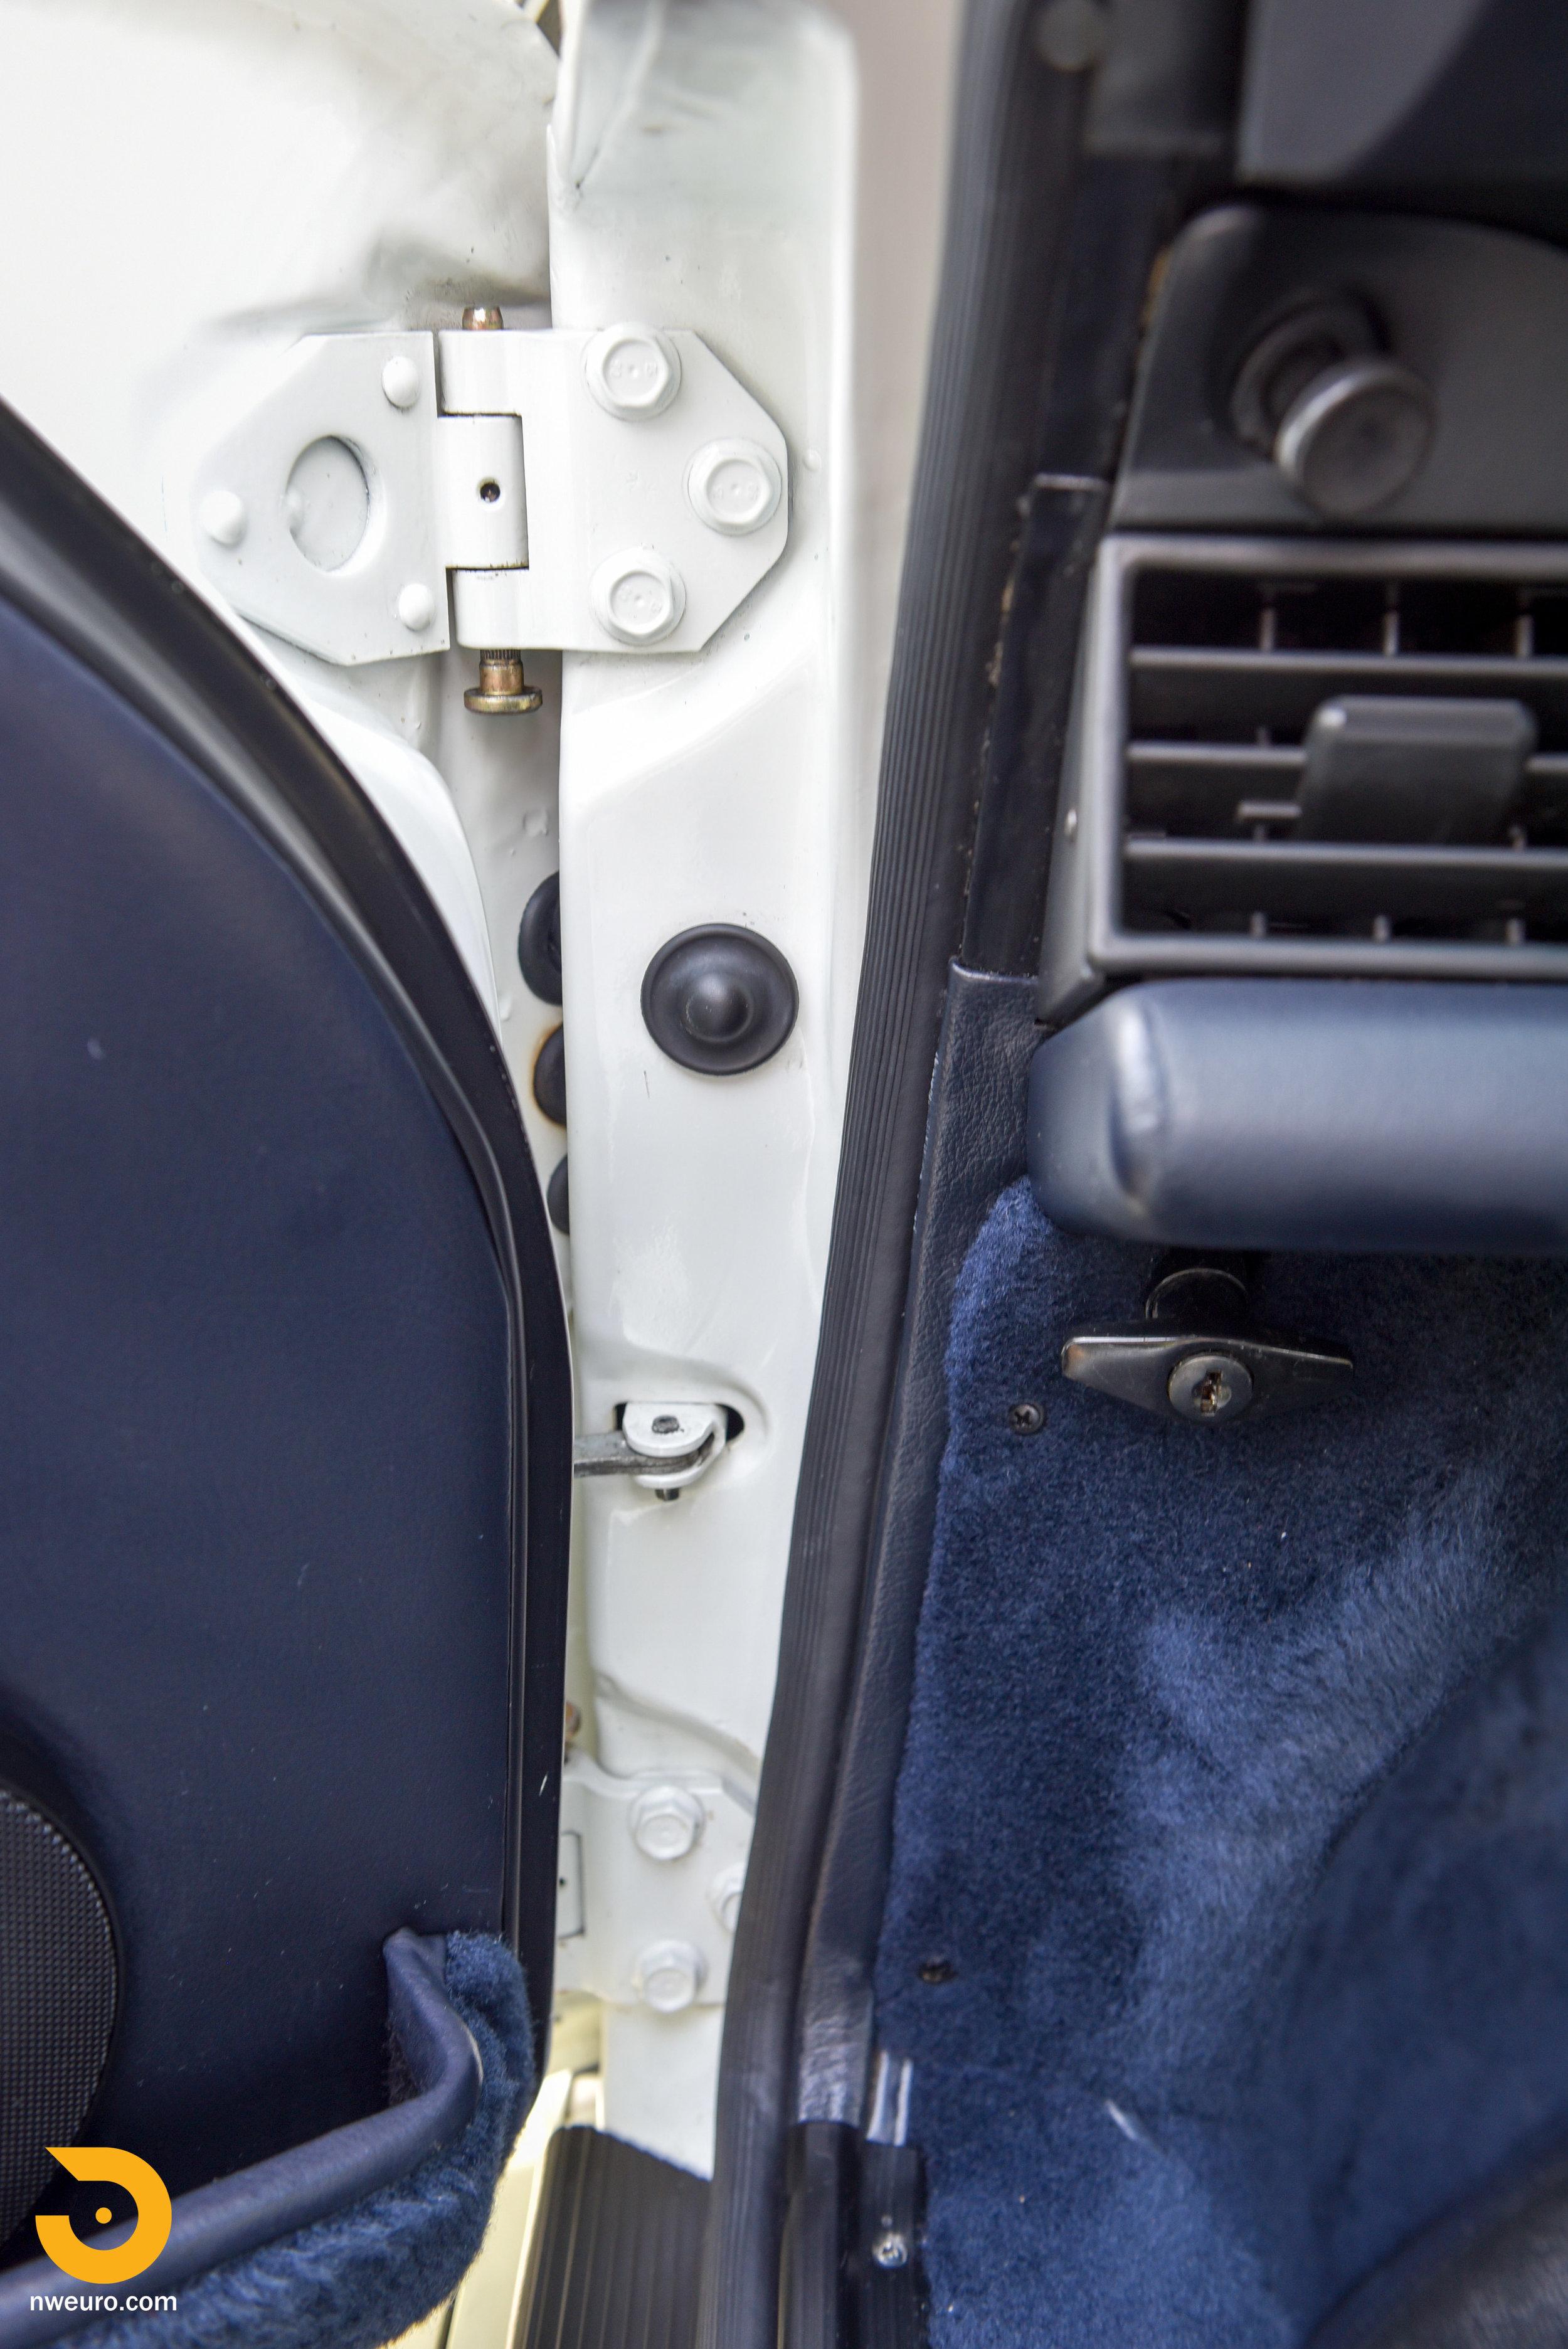 1987 Porsche 930 Slant Nose Cab-39.jpg